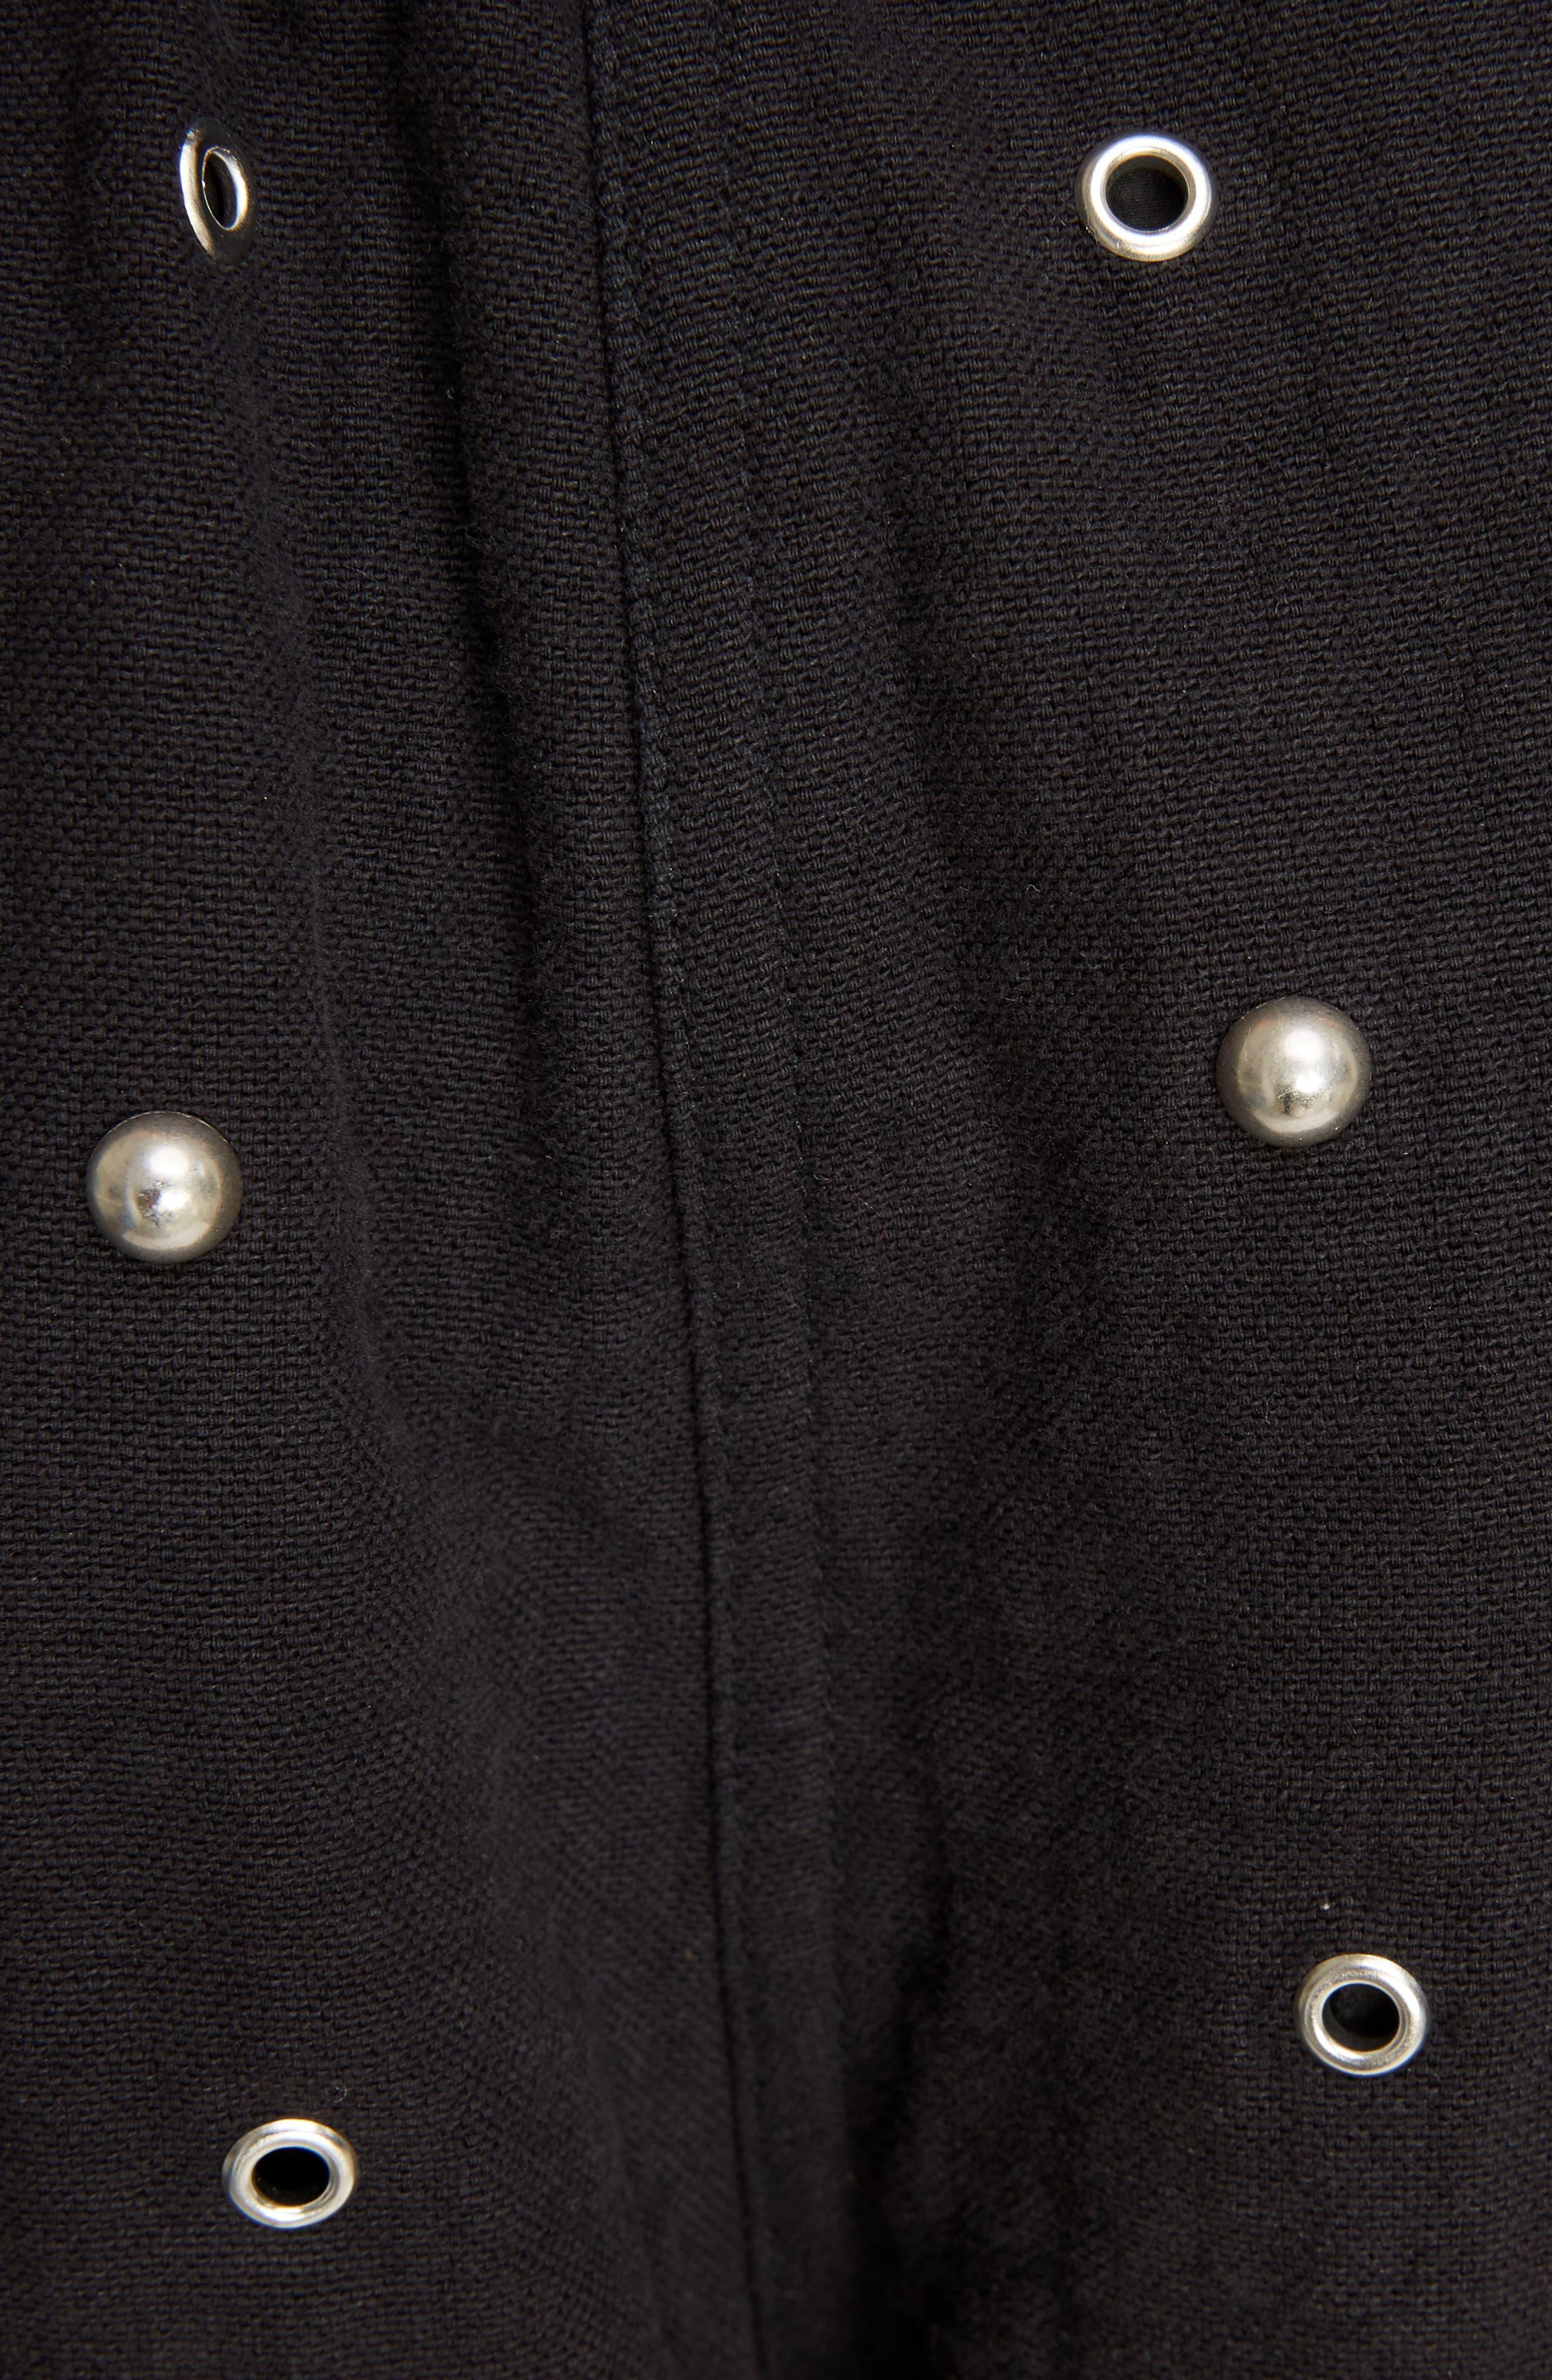 Grommet & Stud Shorts,                             Alternate thumbnail 5, color,                             002